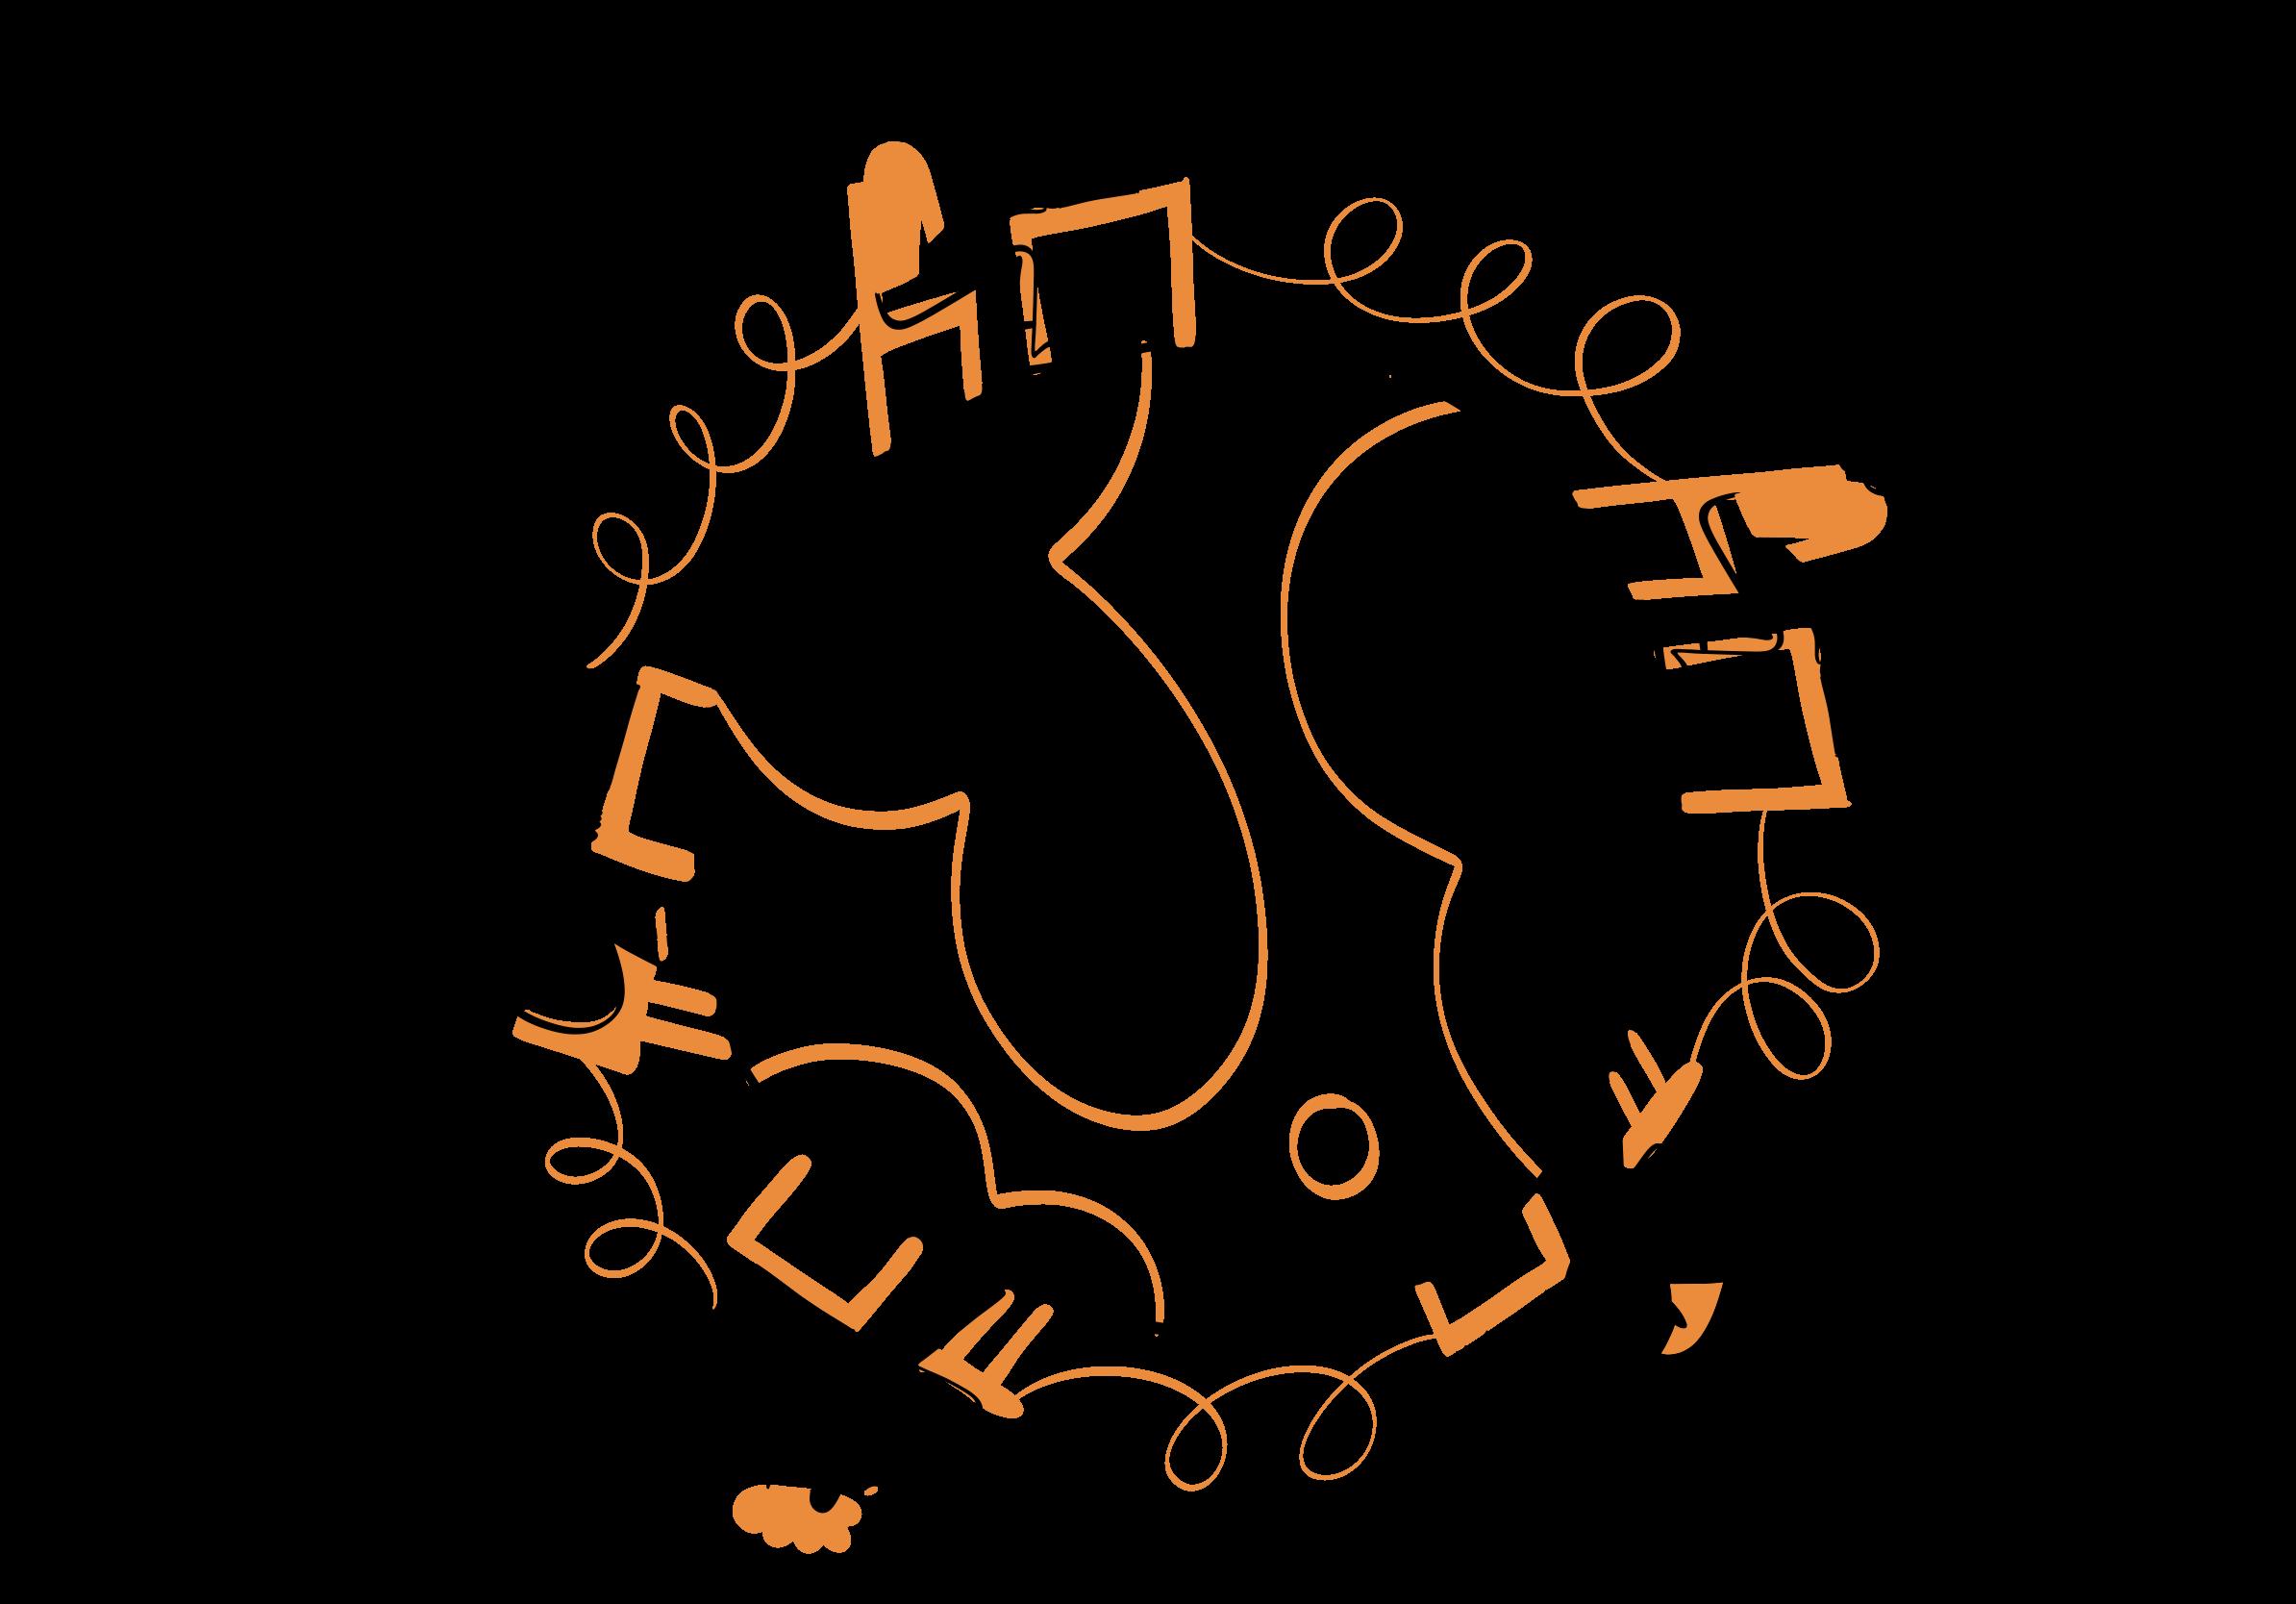 [foundkit]-[web illustration]-[sketches] 6